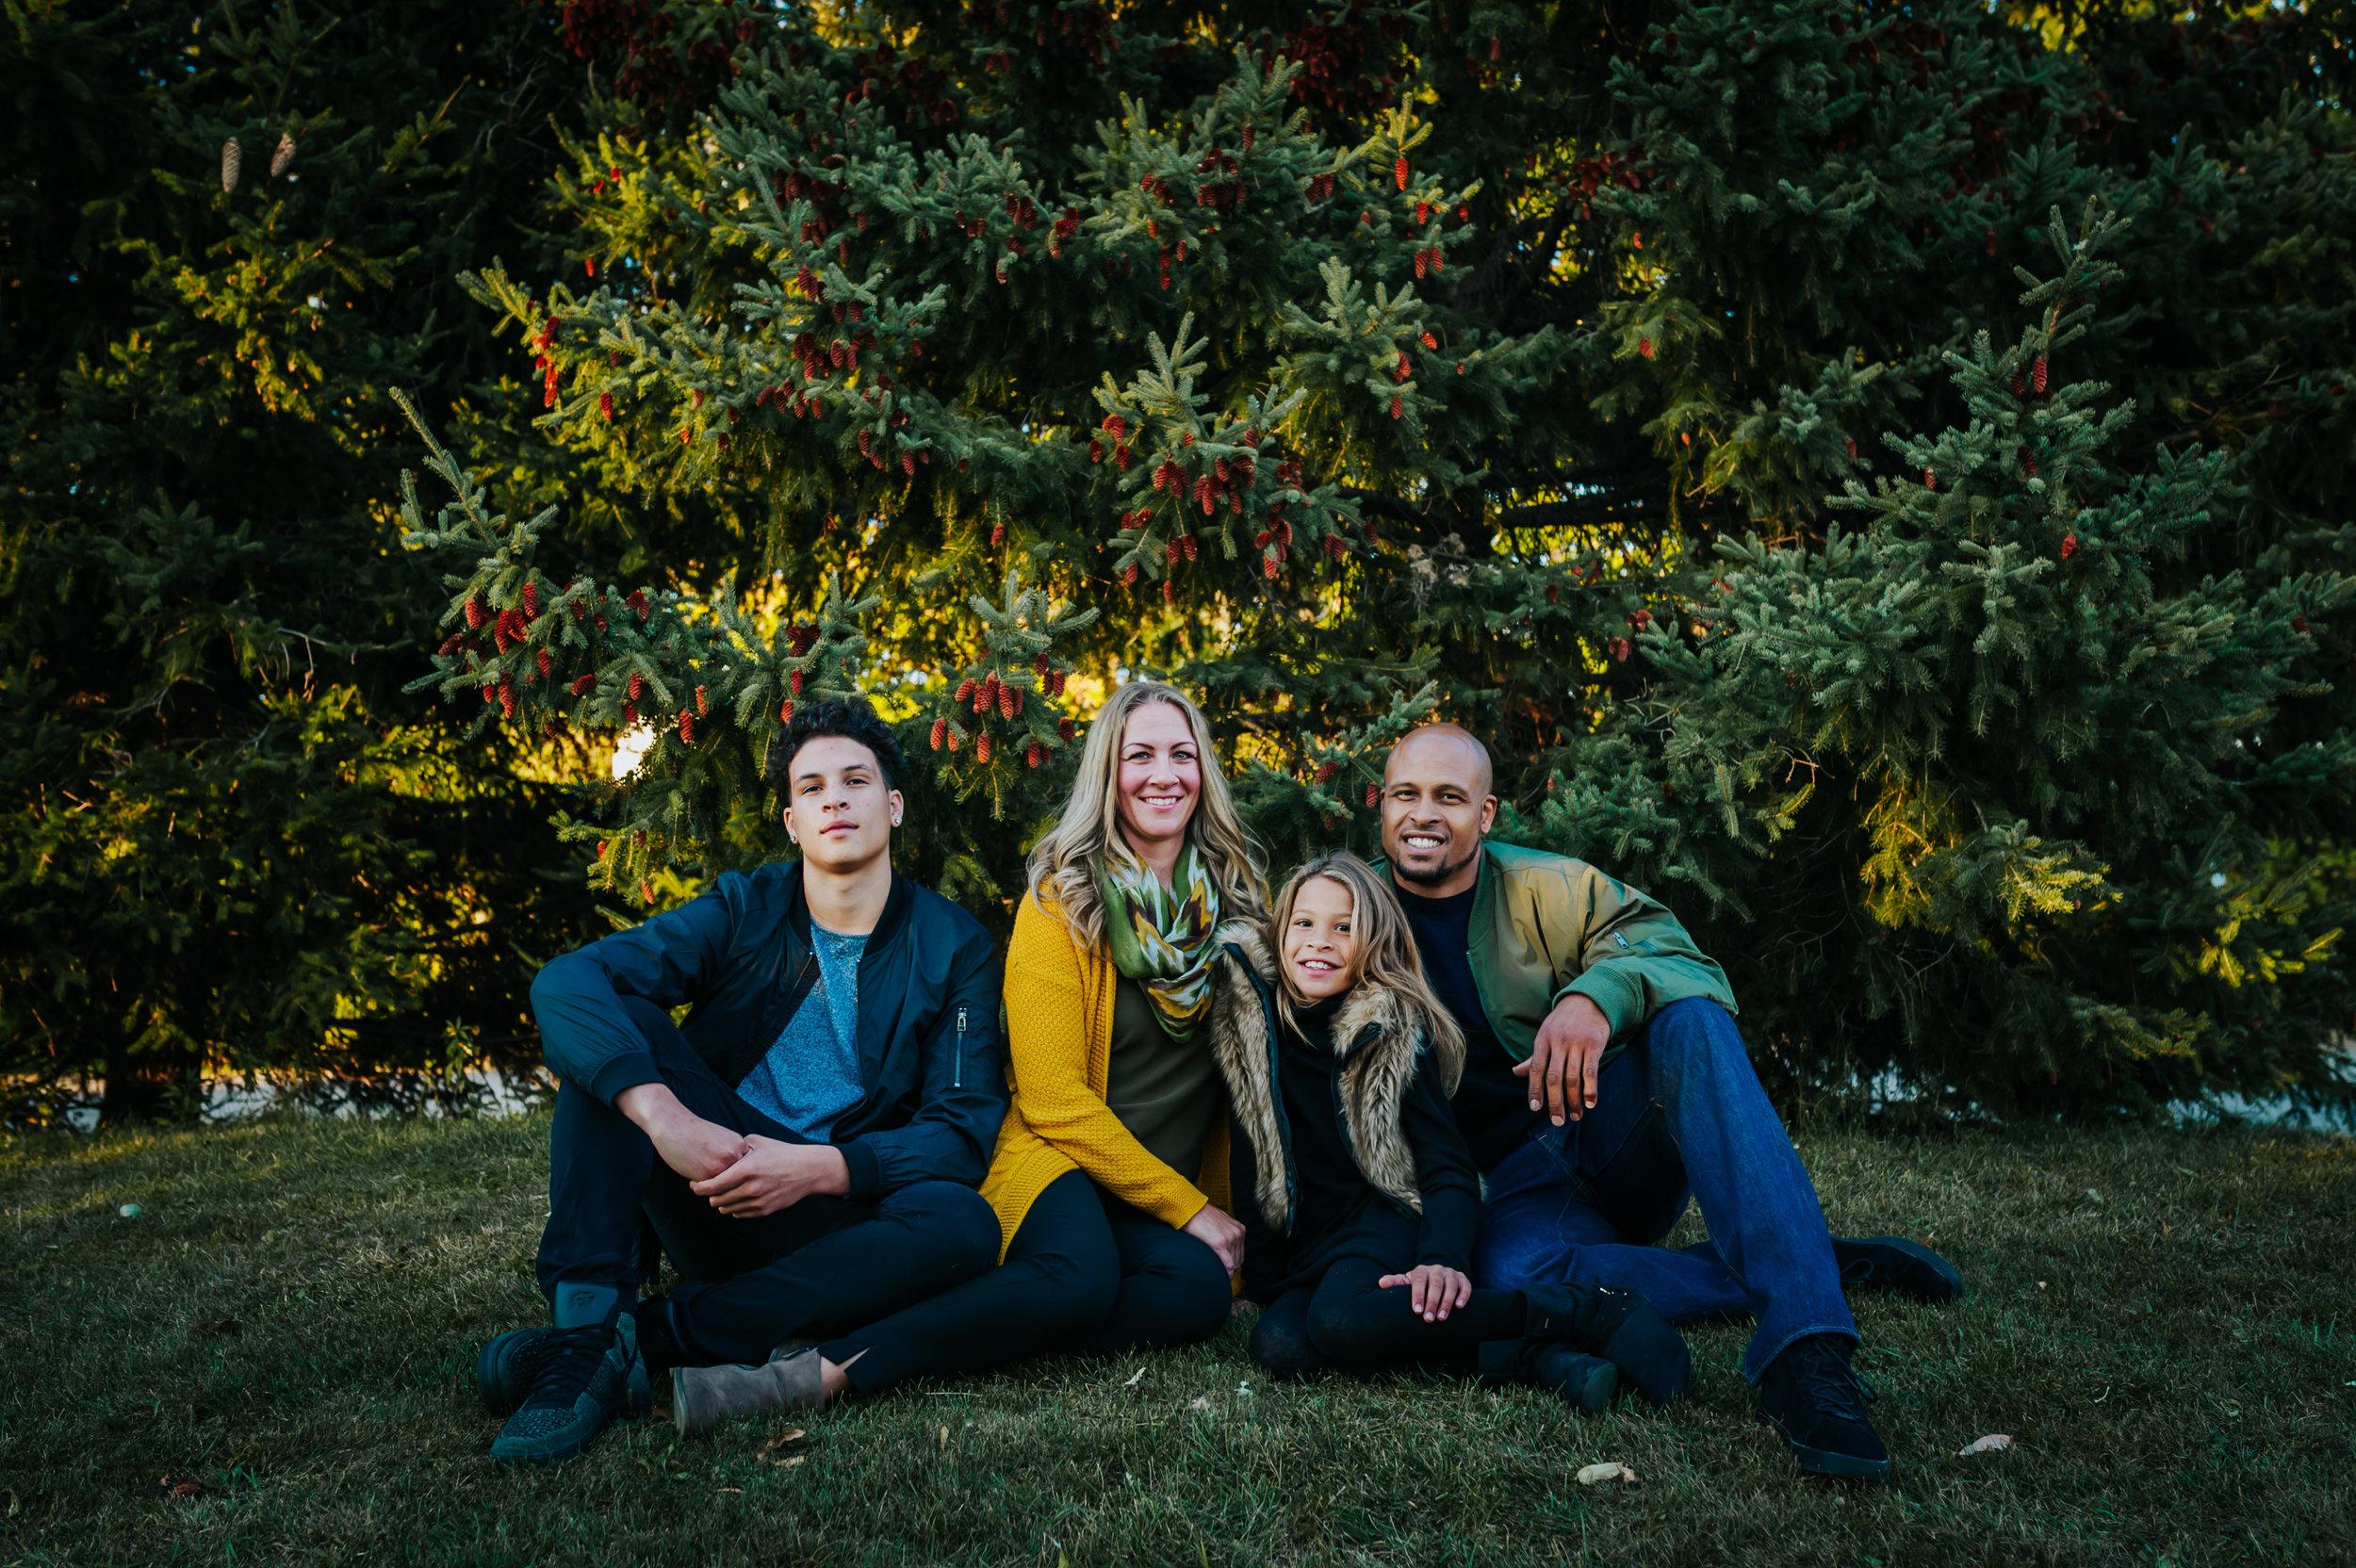 burlington family photographer, lifestyle photographer, Burlington, family photographer,fall mini, lifestyle photography